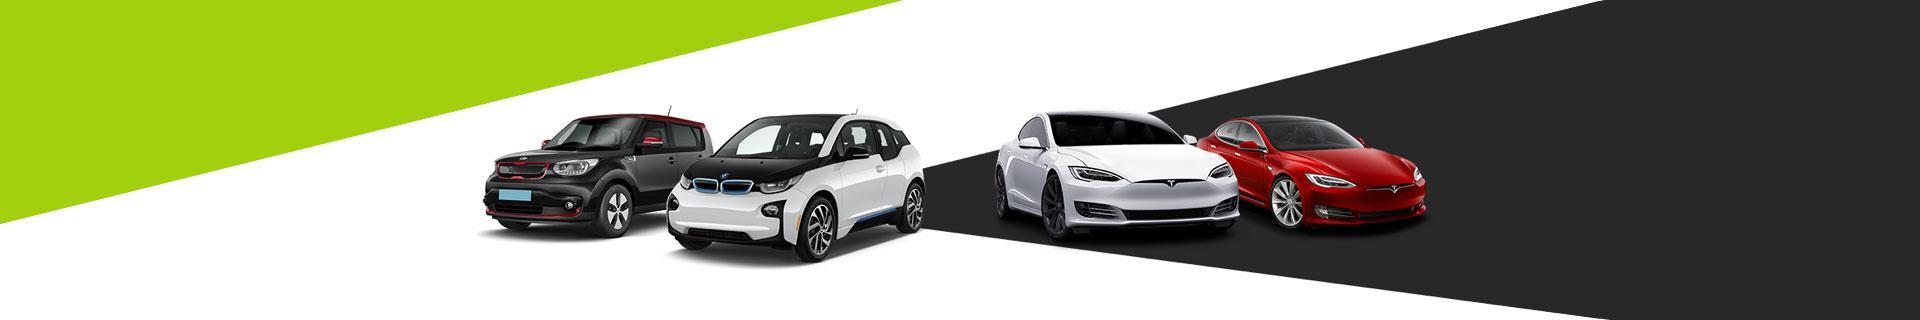 E-Autos.de – Marktplatz für Elektromobilität